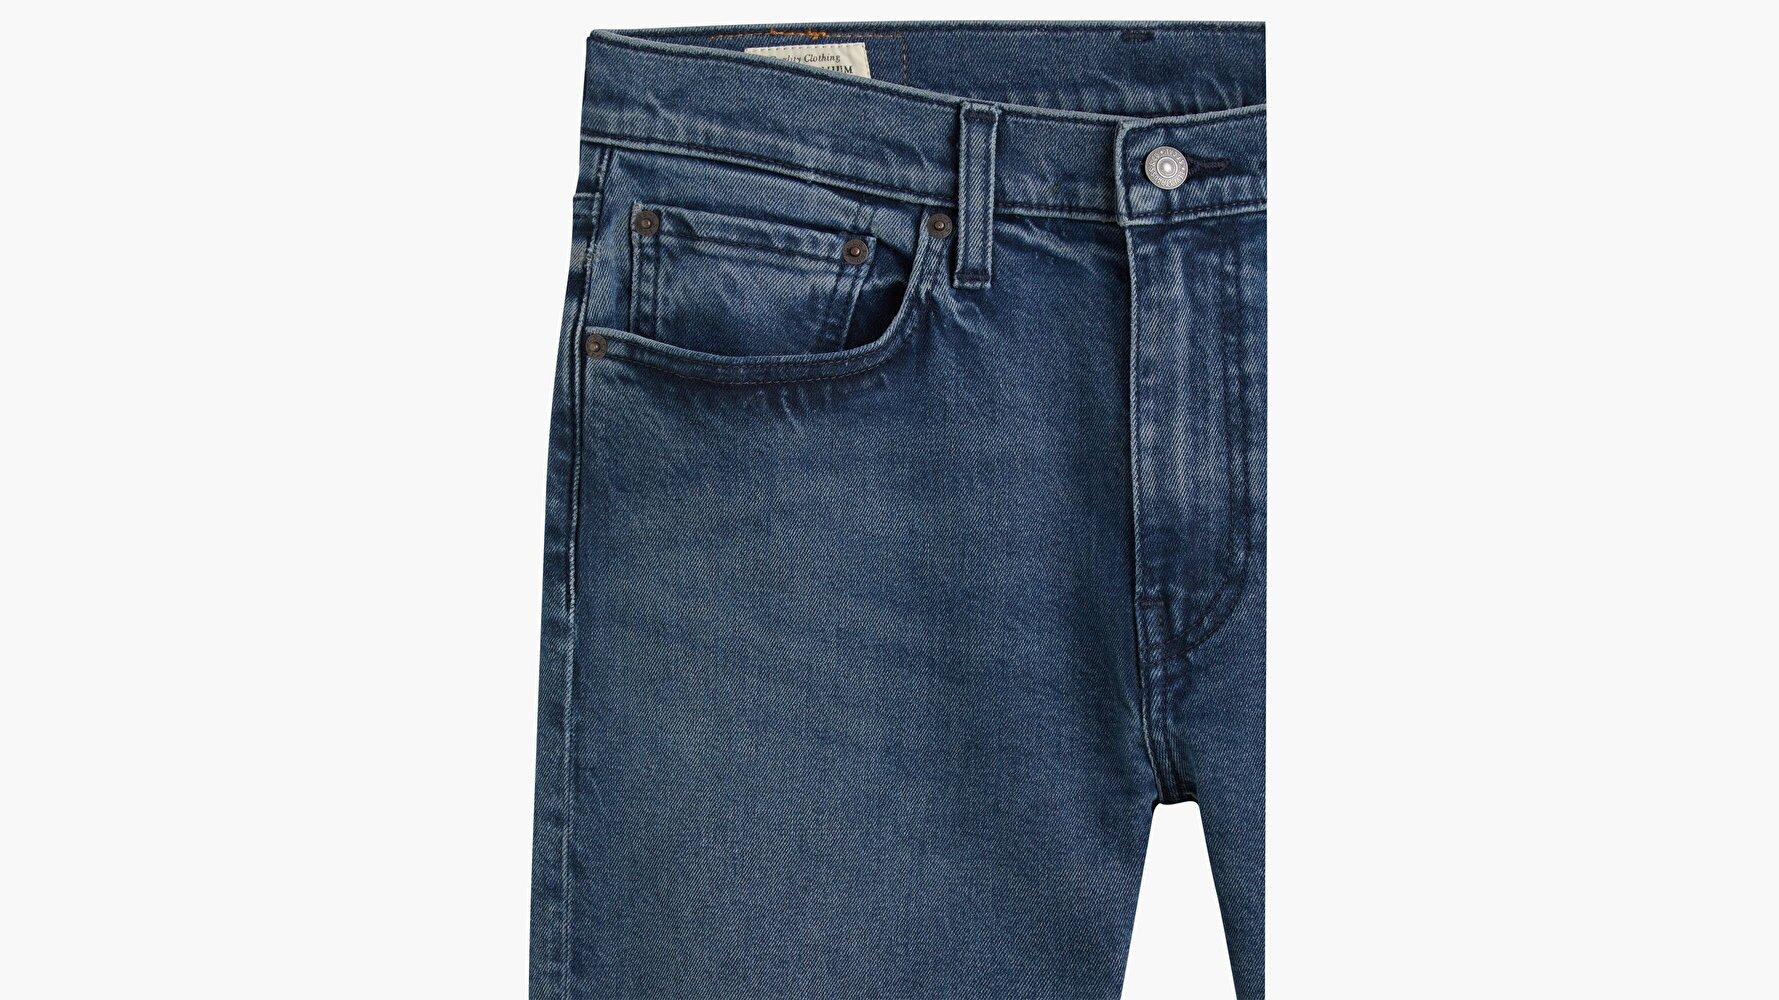 512™ Slim Taper Erkek Jean Pantolon - Clean Hands - Dark Indigo